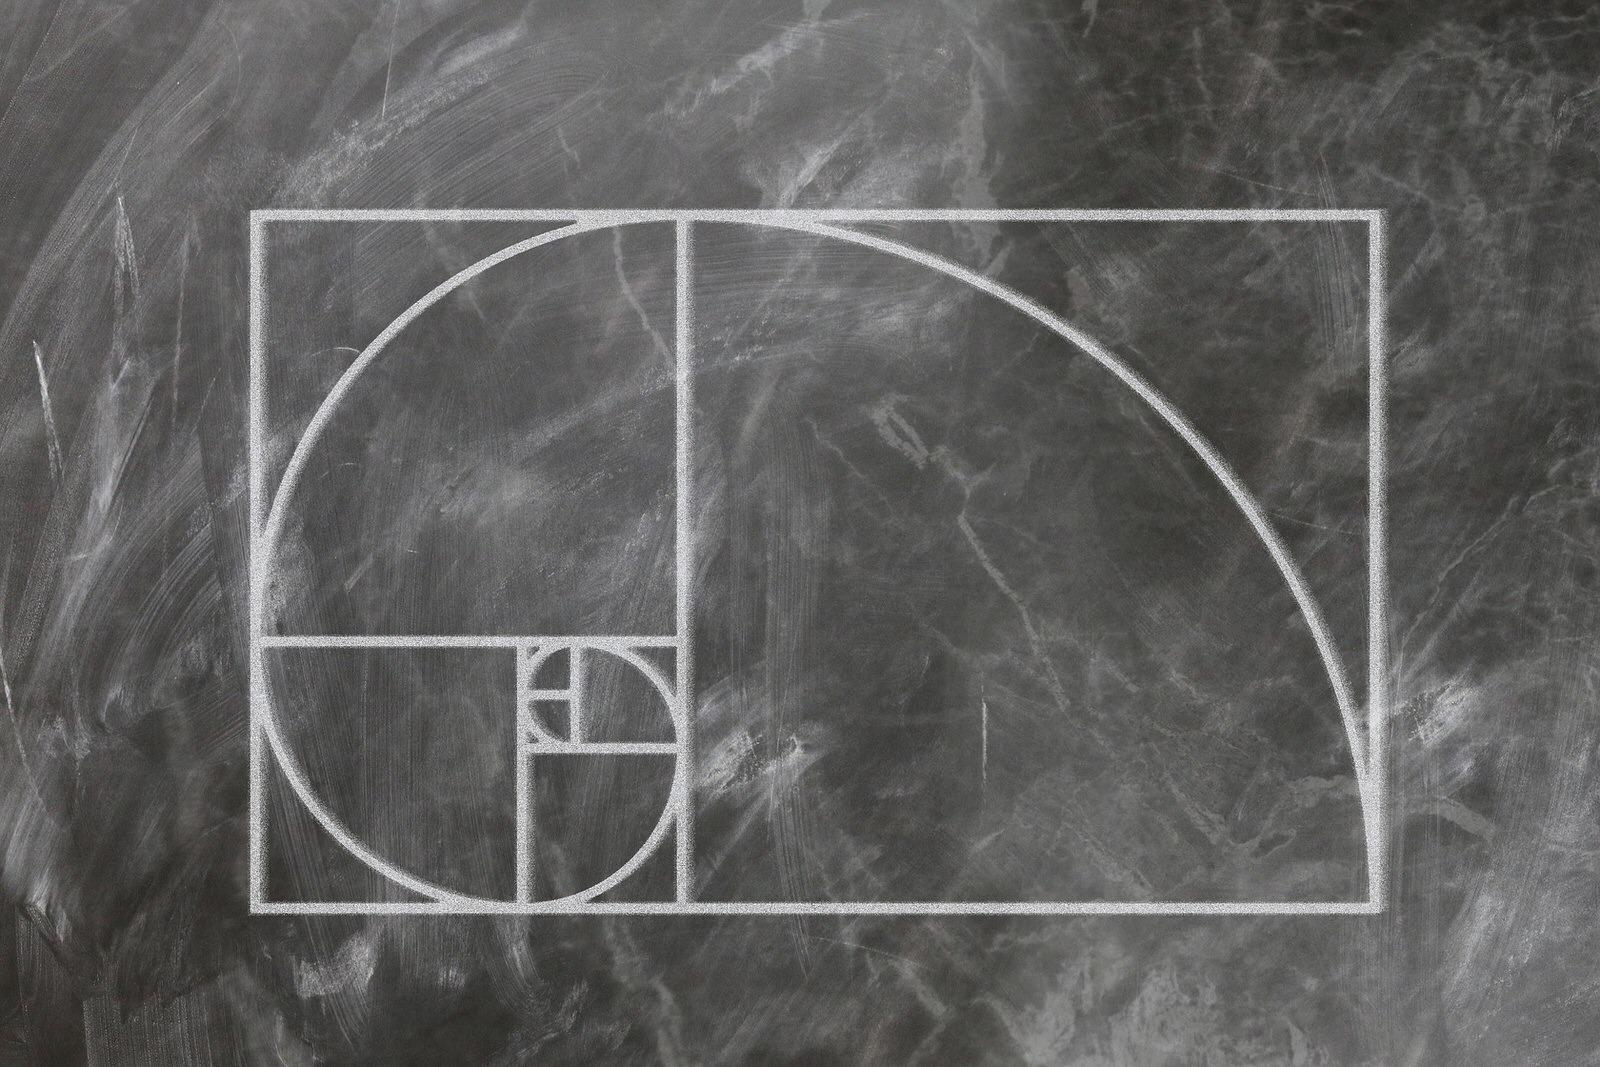 Fibonacci Sequence Image